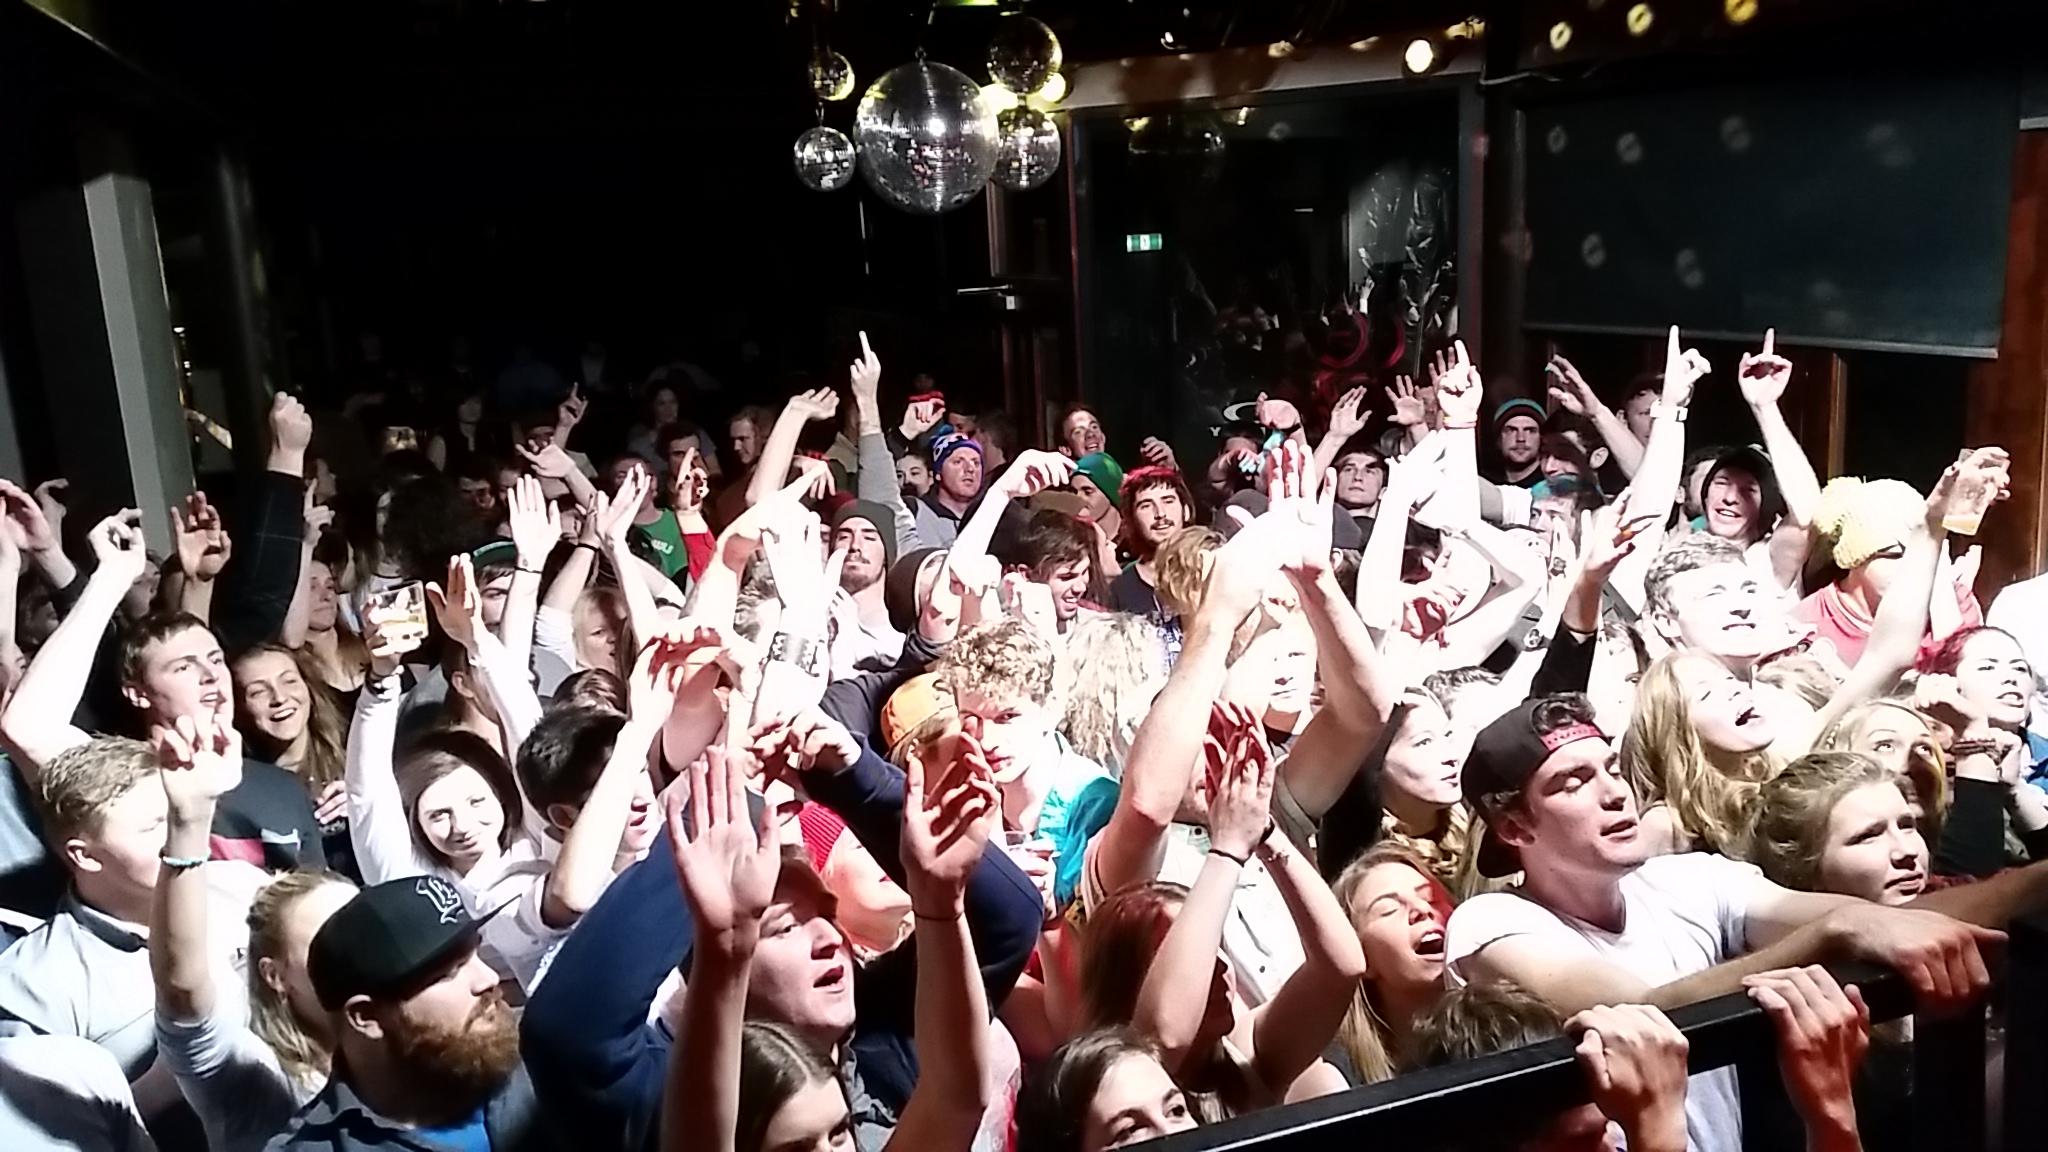 big crowd